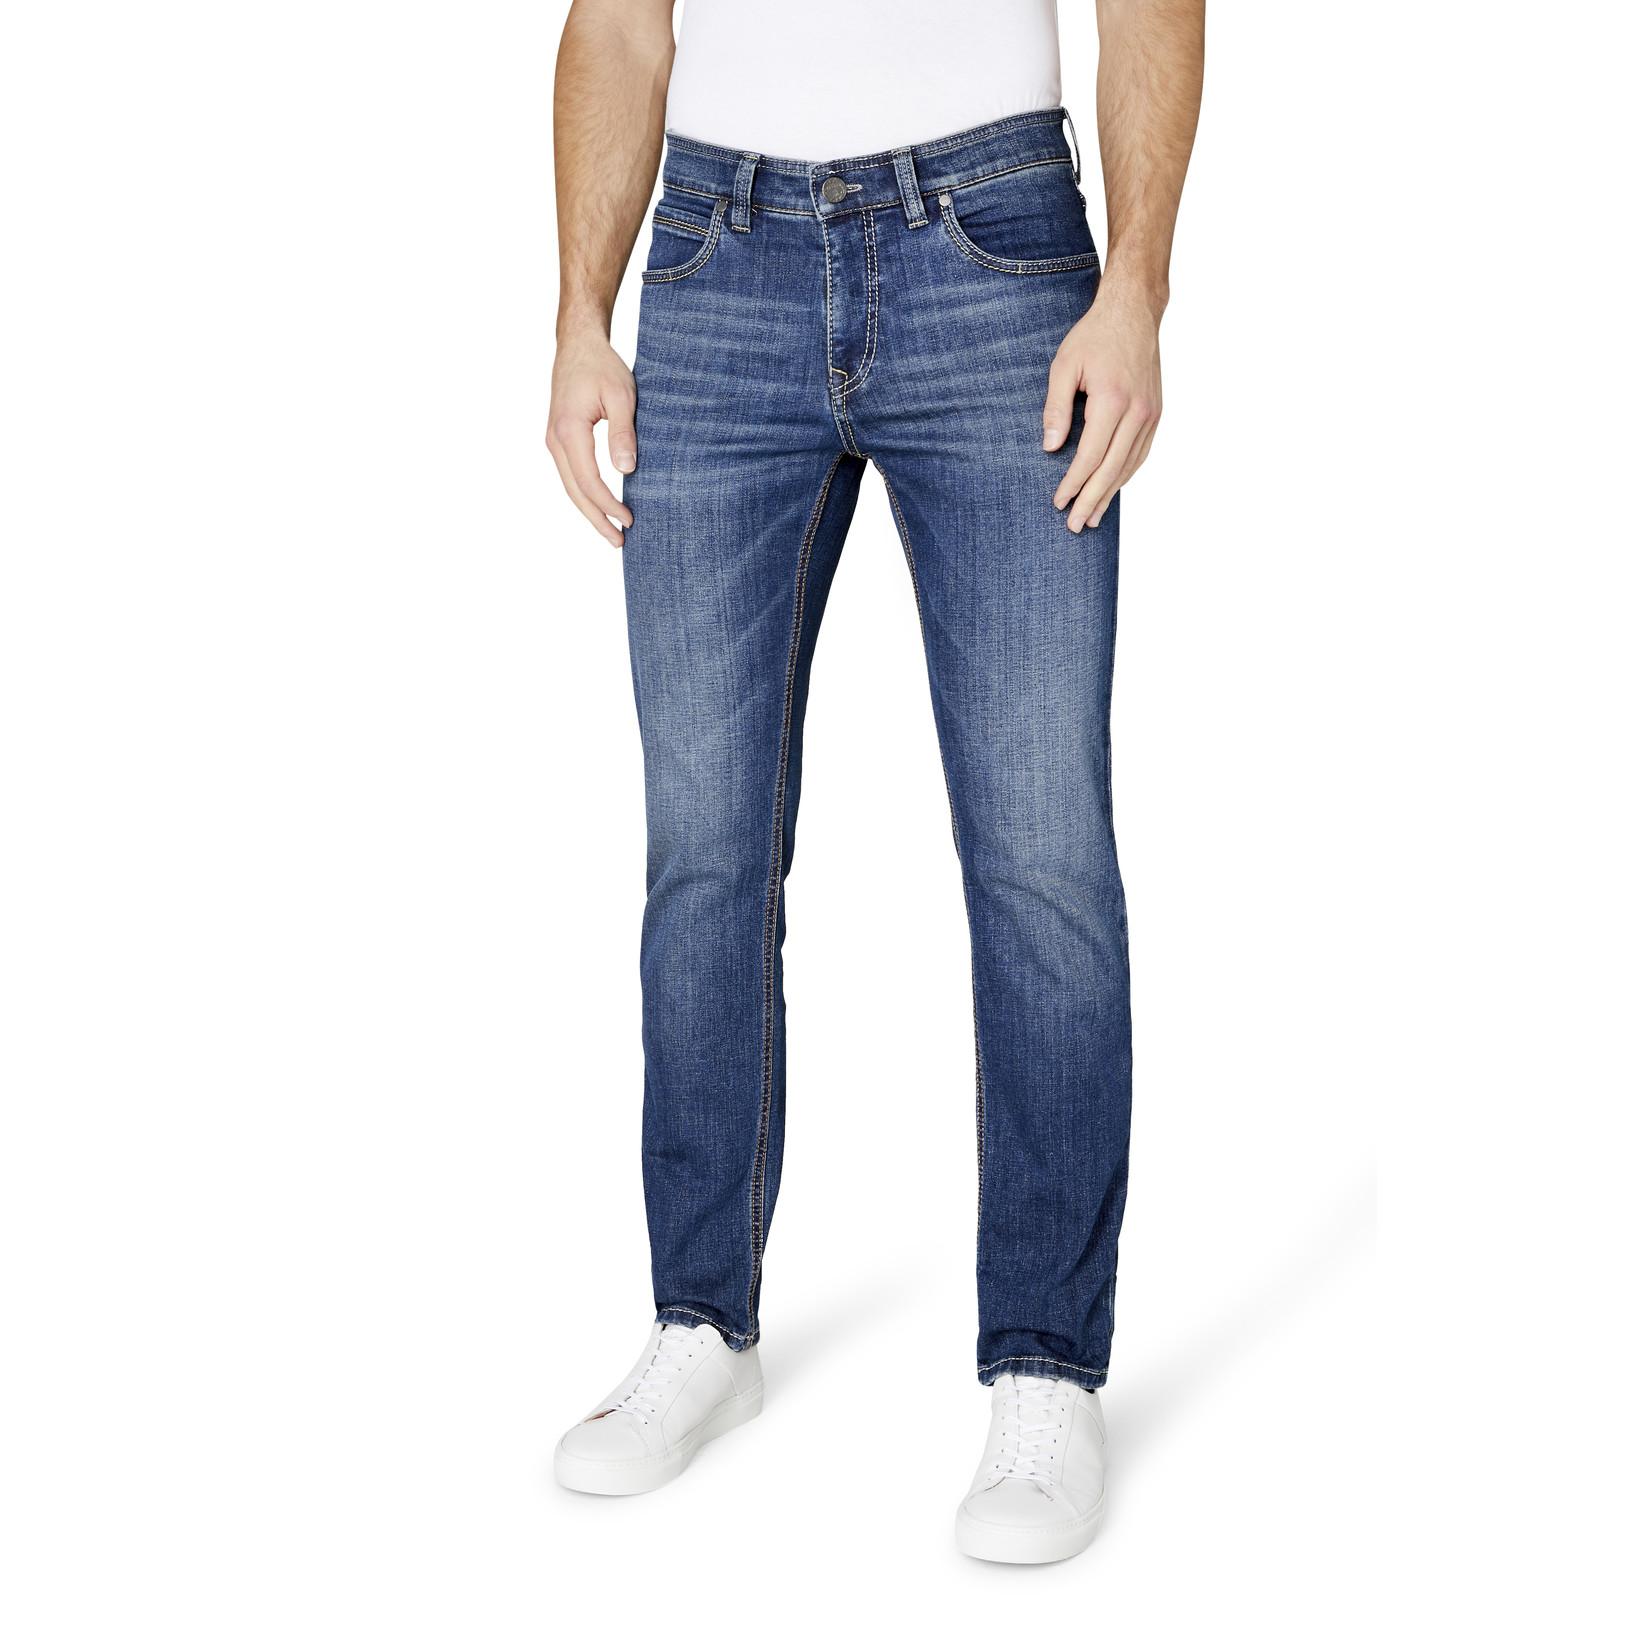 Gardeur Batu-2 modern fit jeans lichtblauw 71001-067